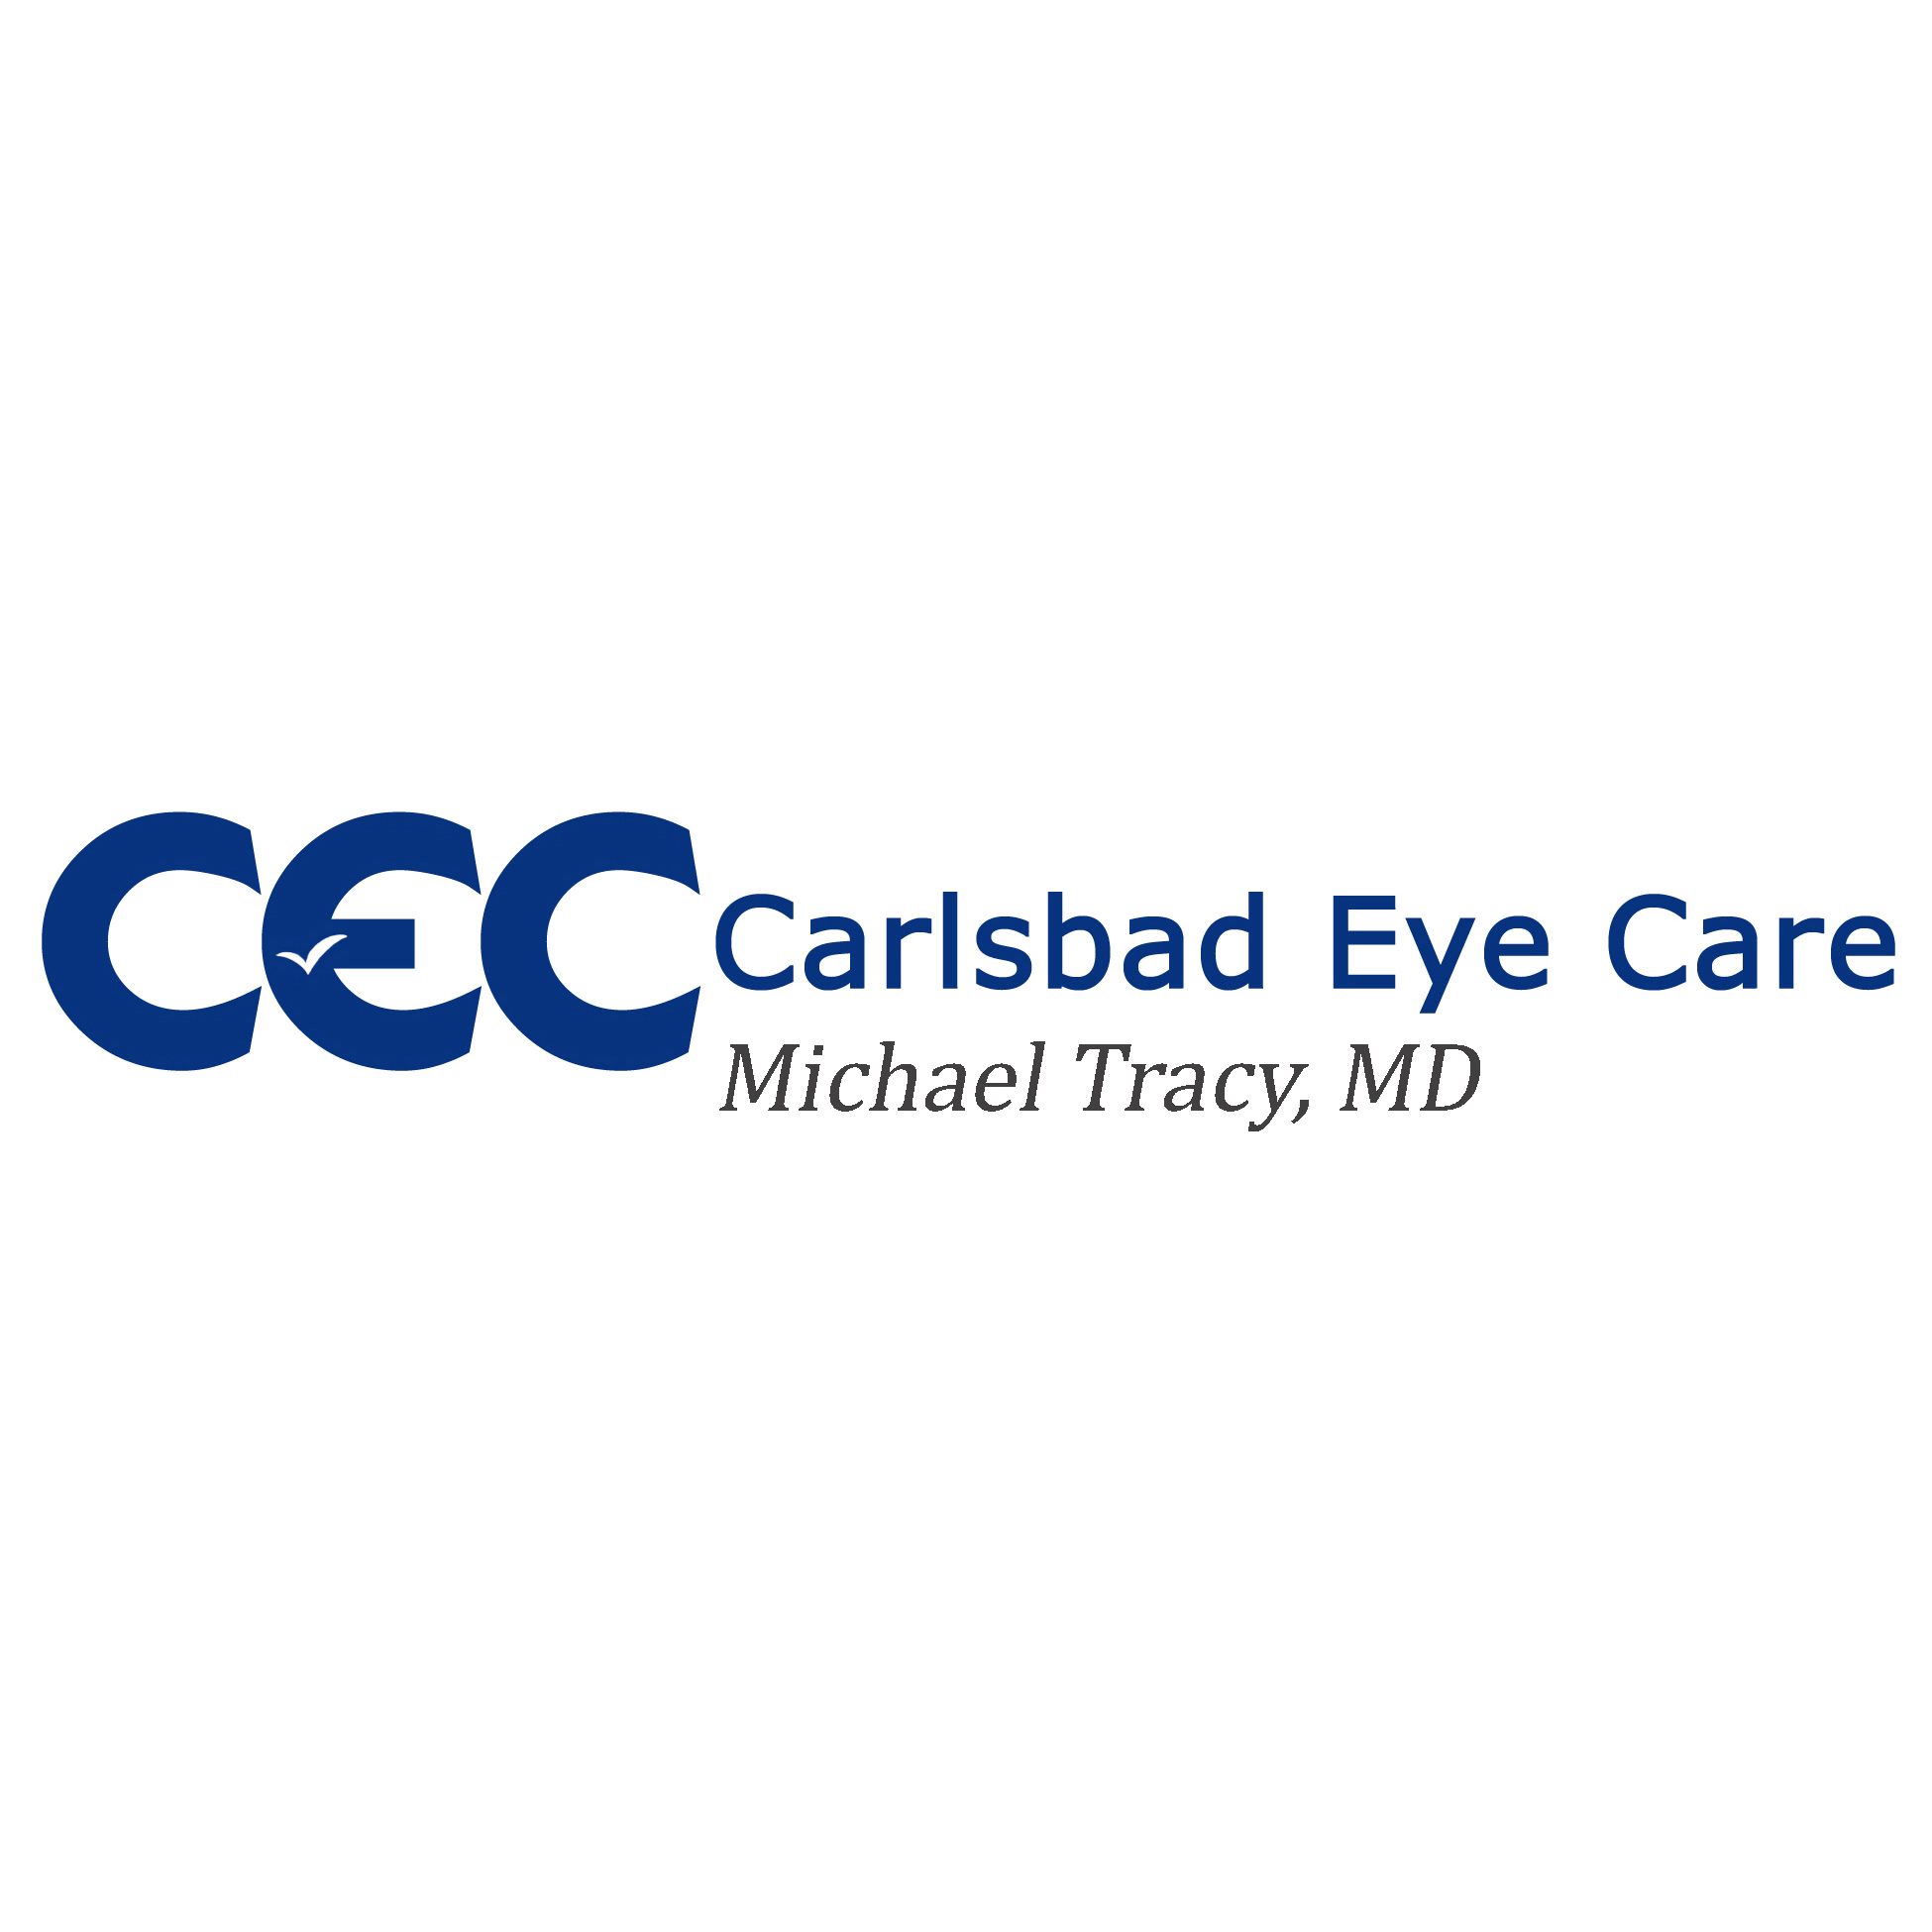 Carlsbad Eye Care